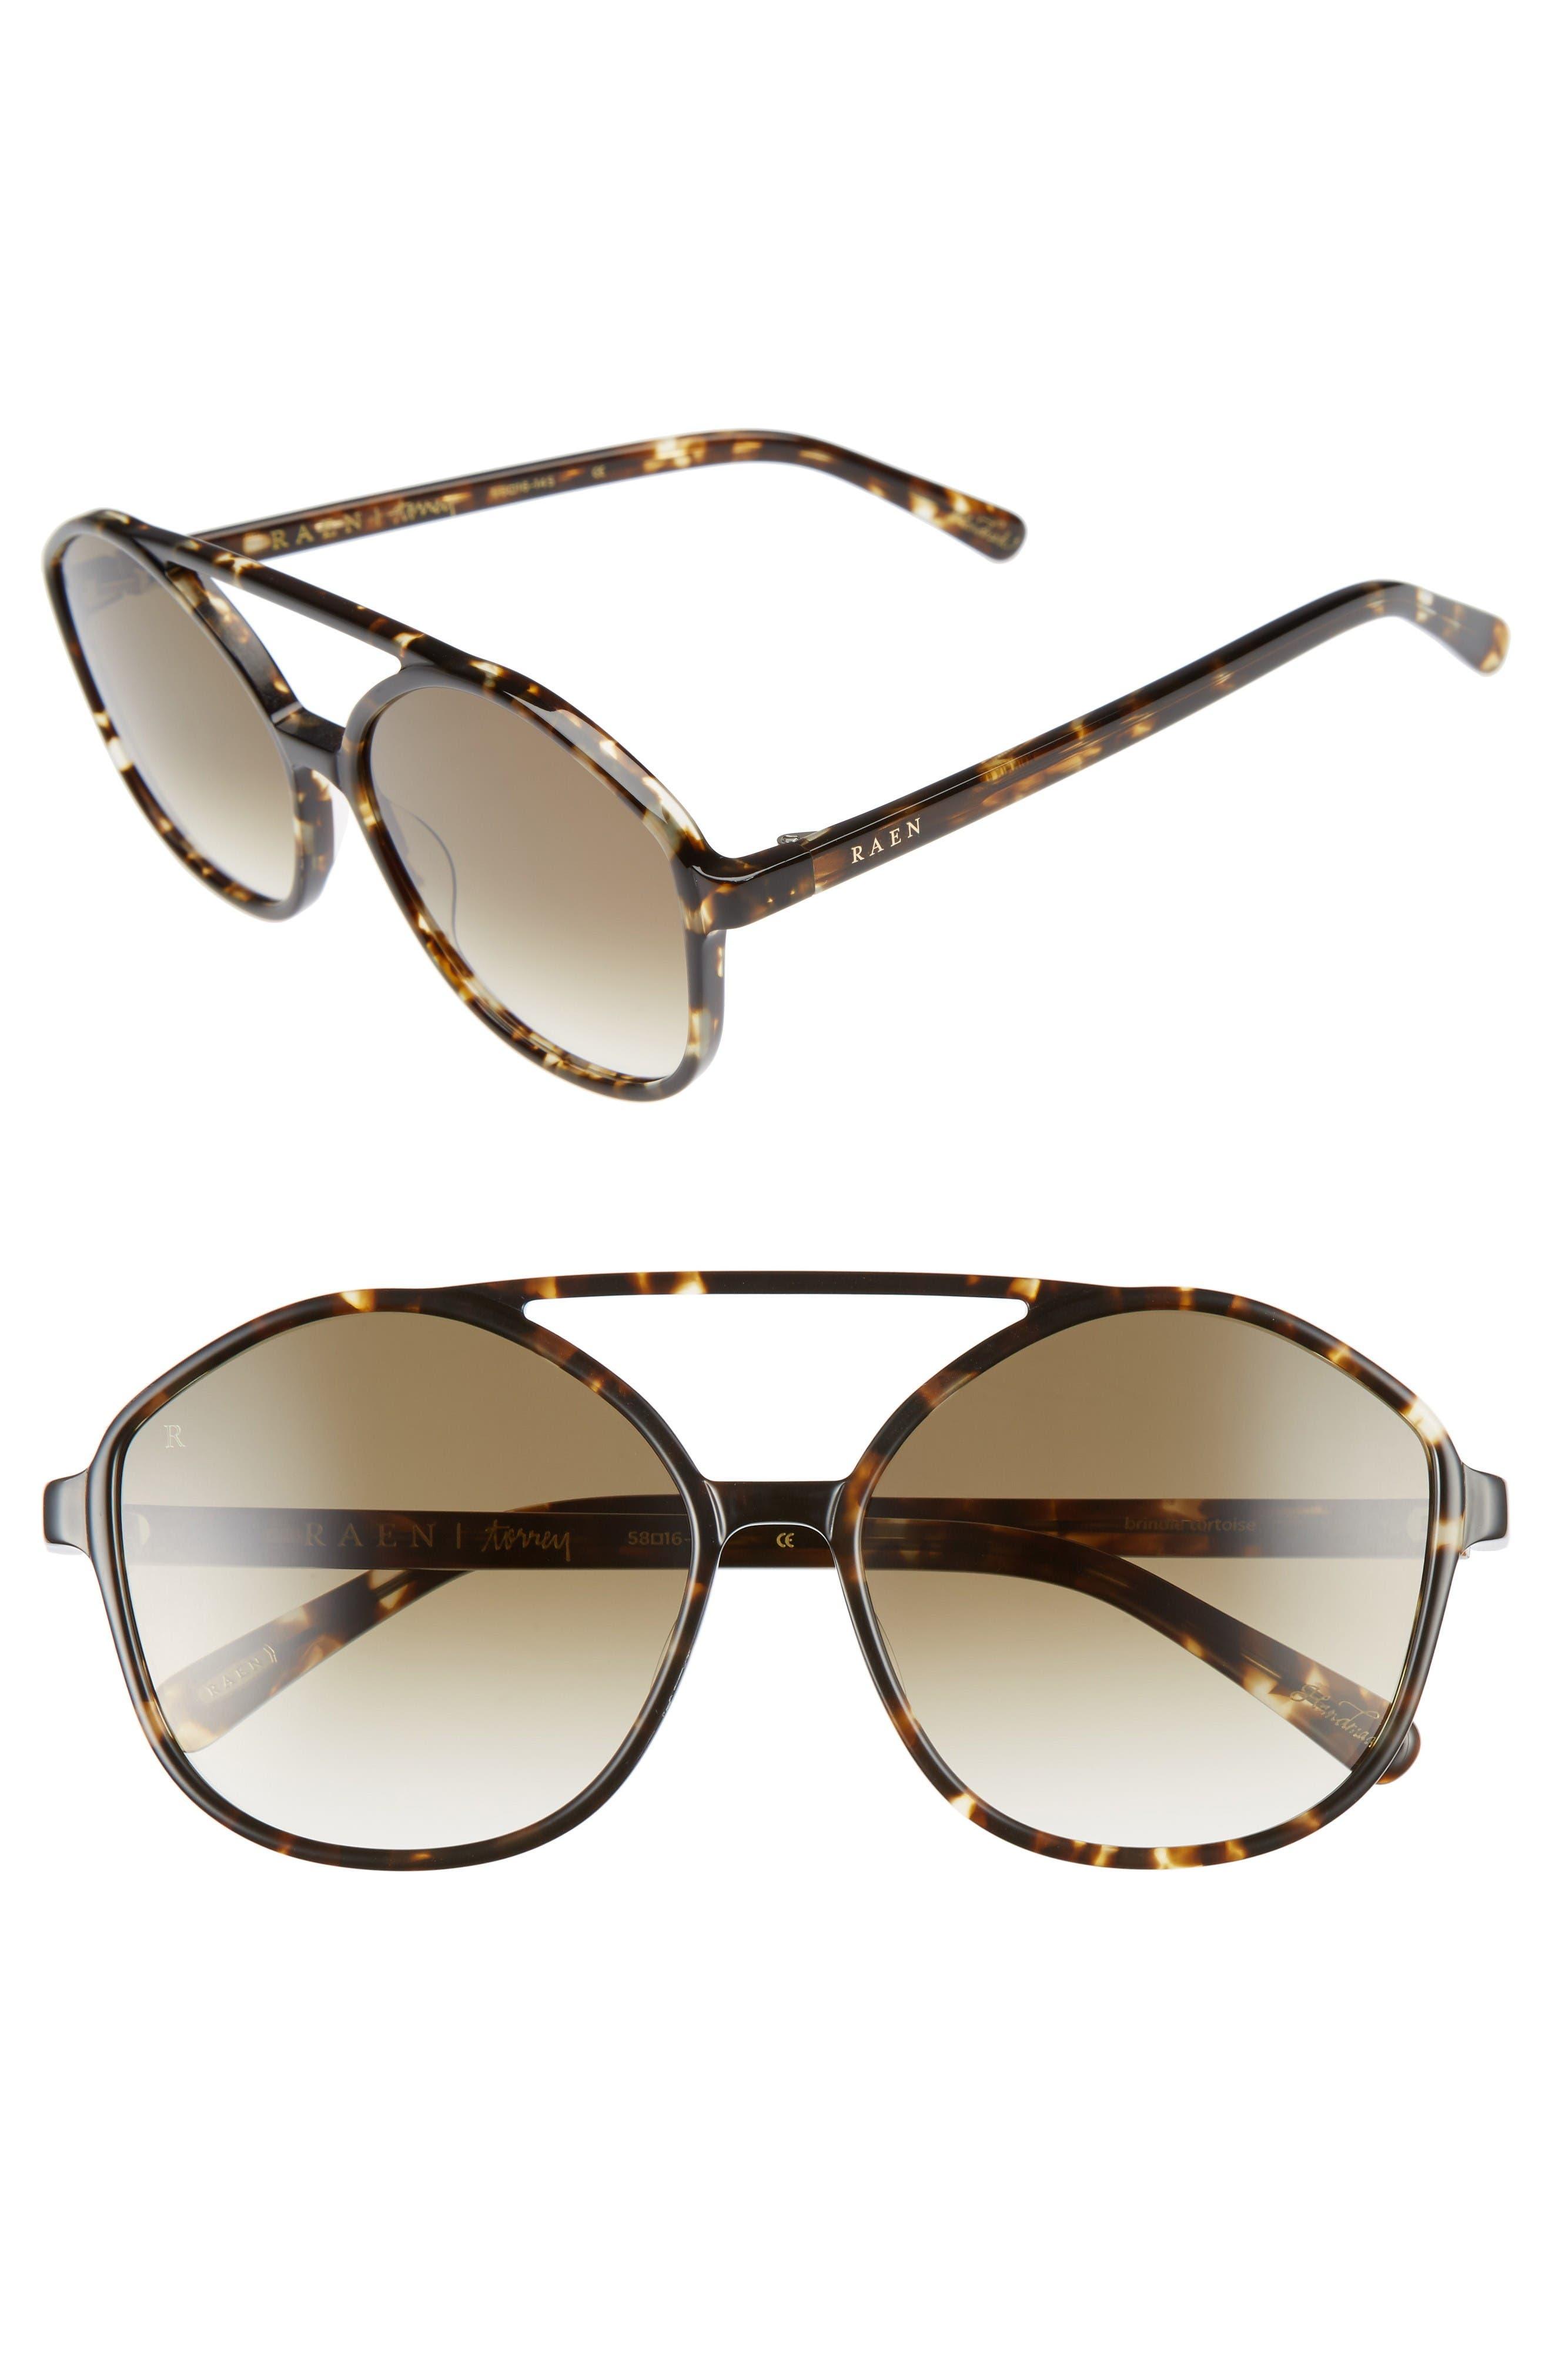 Torrey 58mm Aviator Sunglasses,                         Main,                         color, Brindle Tortoise